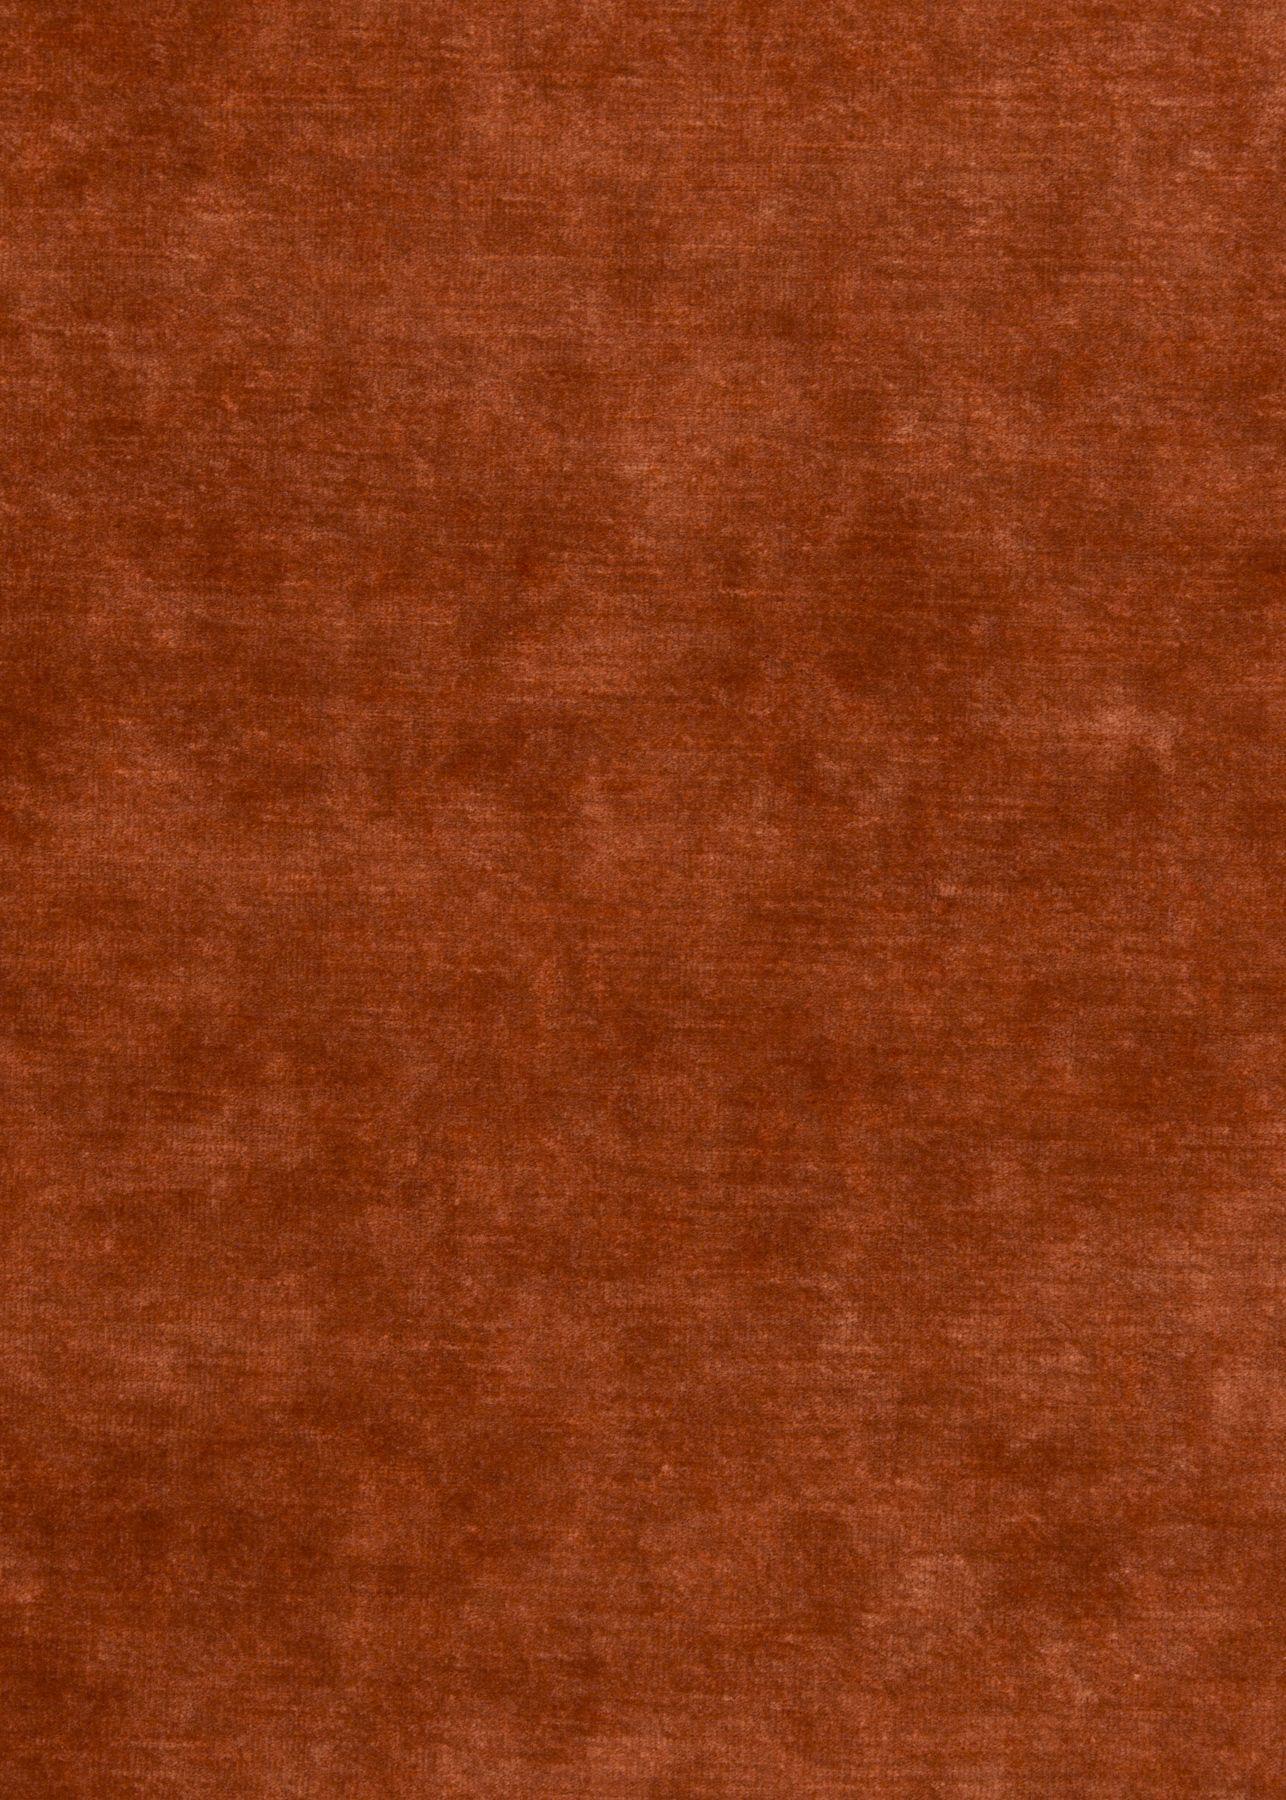 King 039 S Velvet Amber Sofa Fabric Texture Fabric Textures